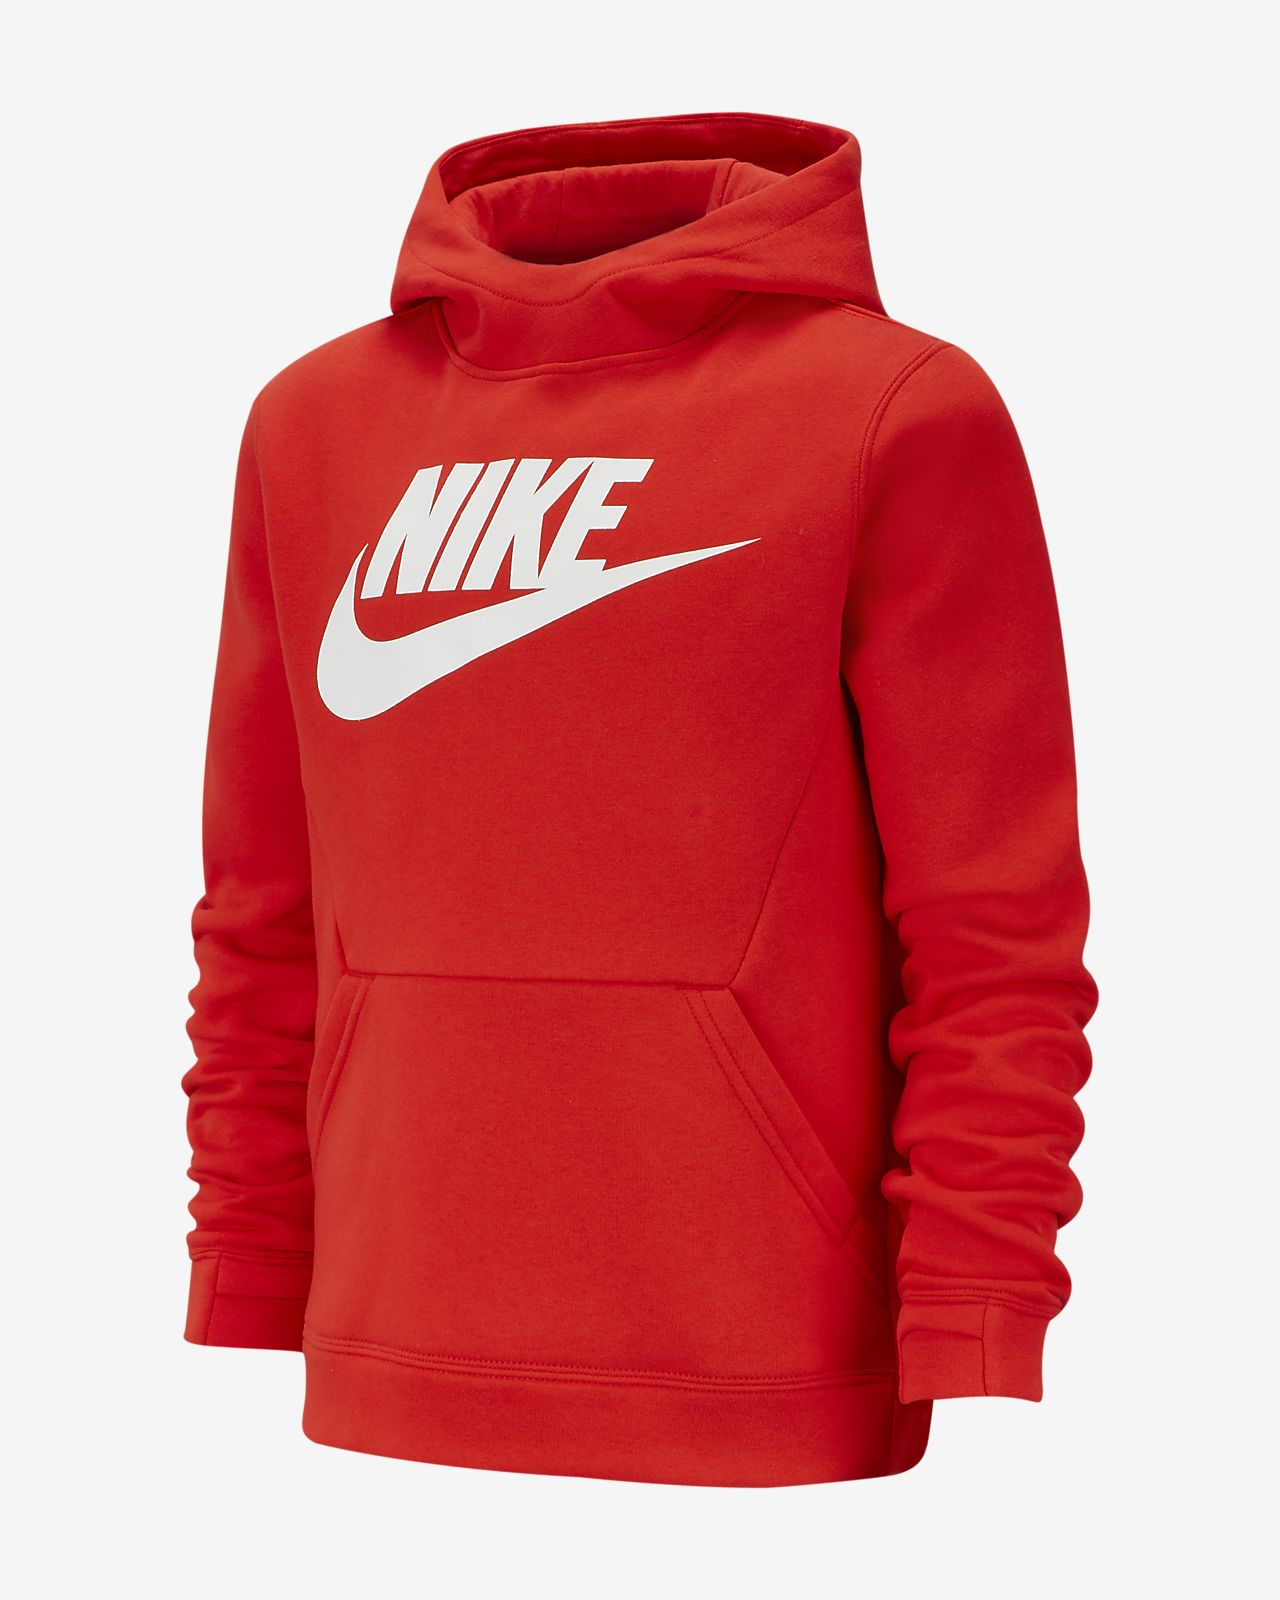 Nike Sportswear-pullover-hættetrøje i fleece til drenge